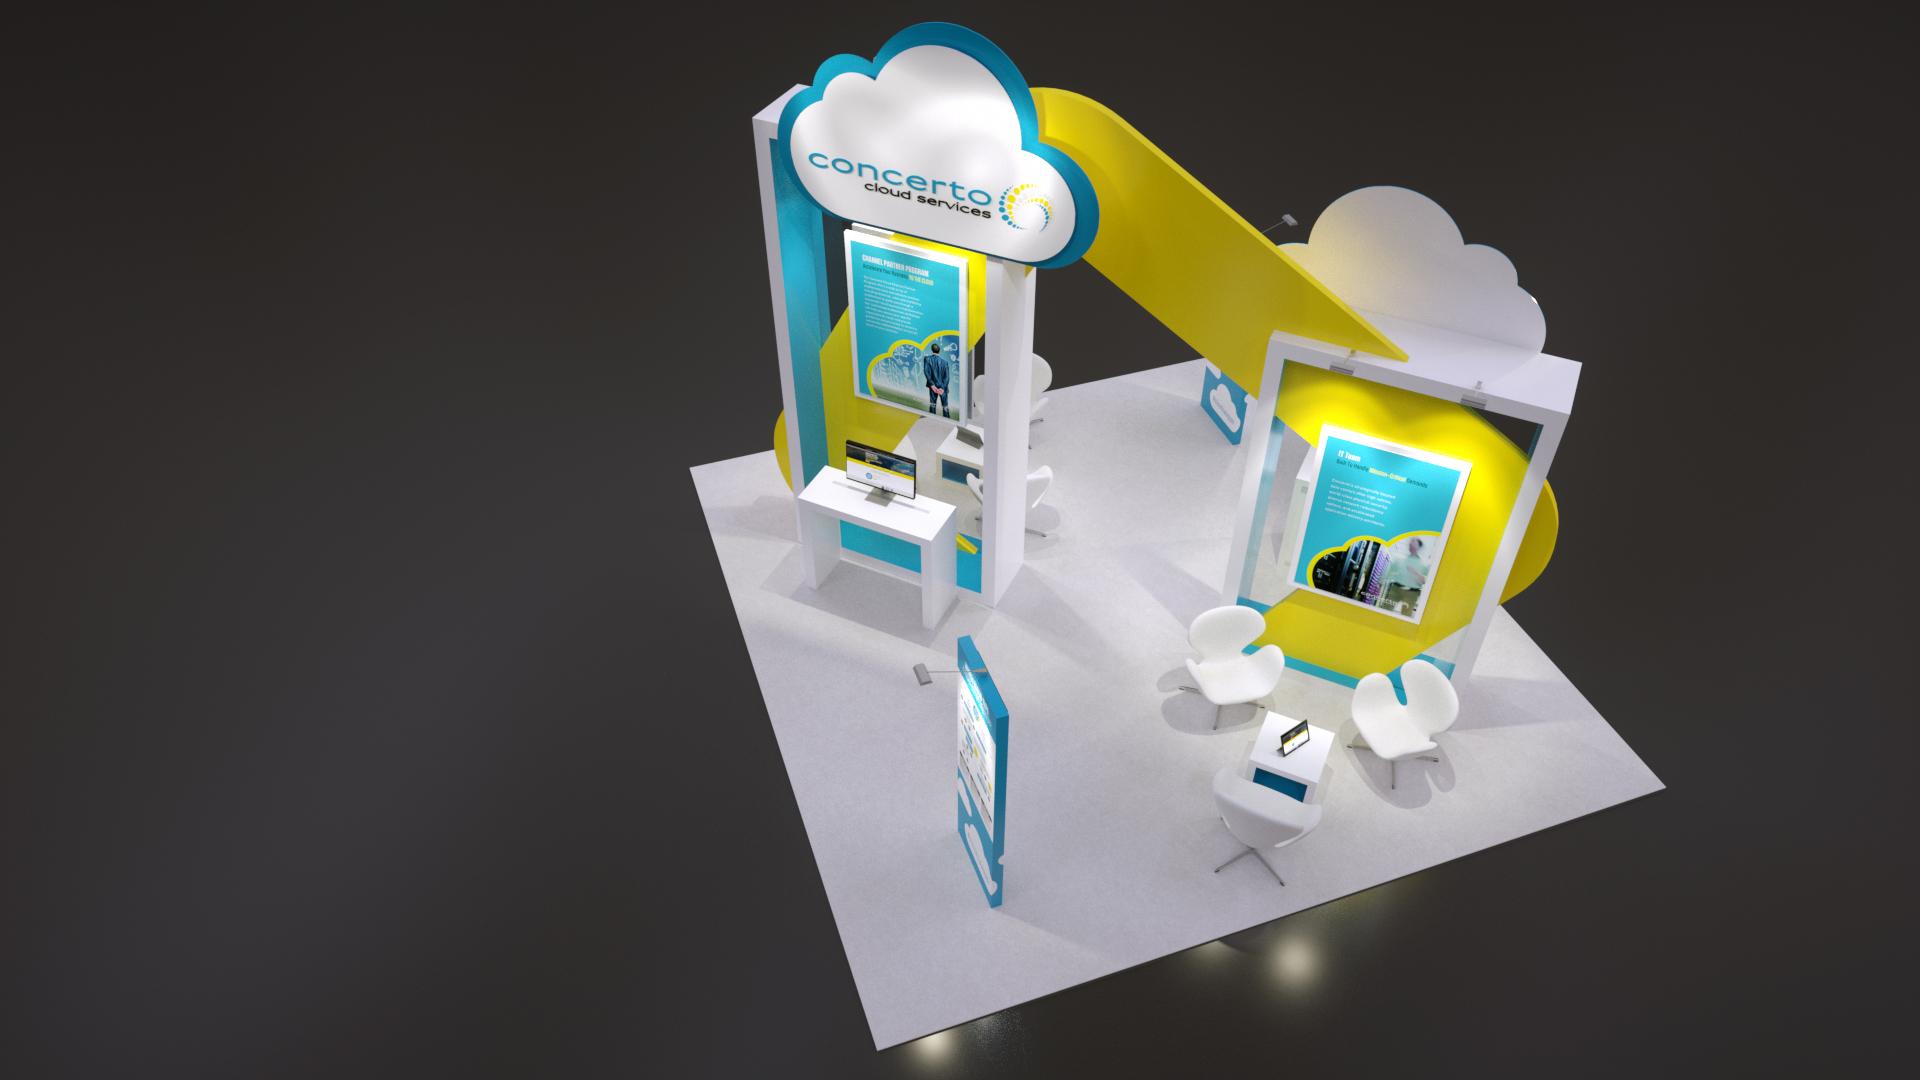 3053 - Concerto Cloud Services - Microsoft Envision 2016 - View 13.jpg